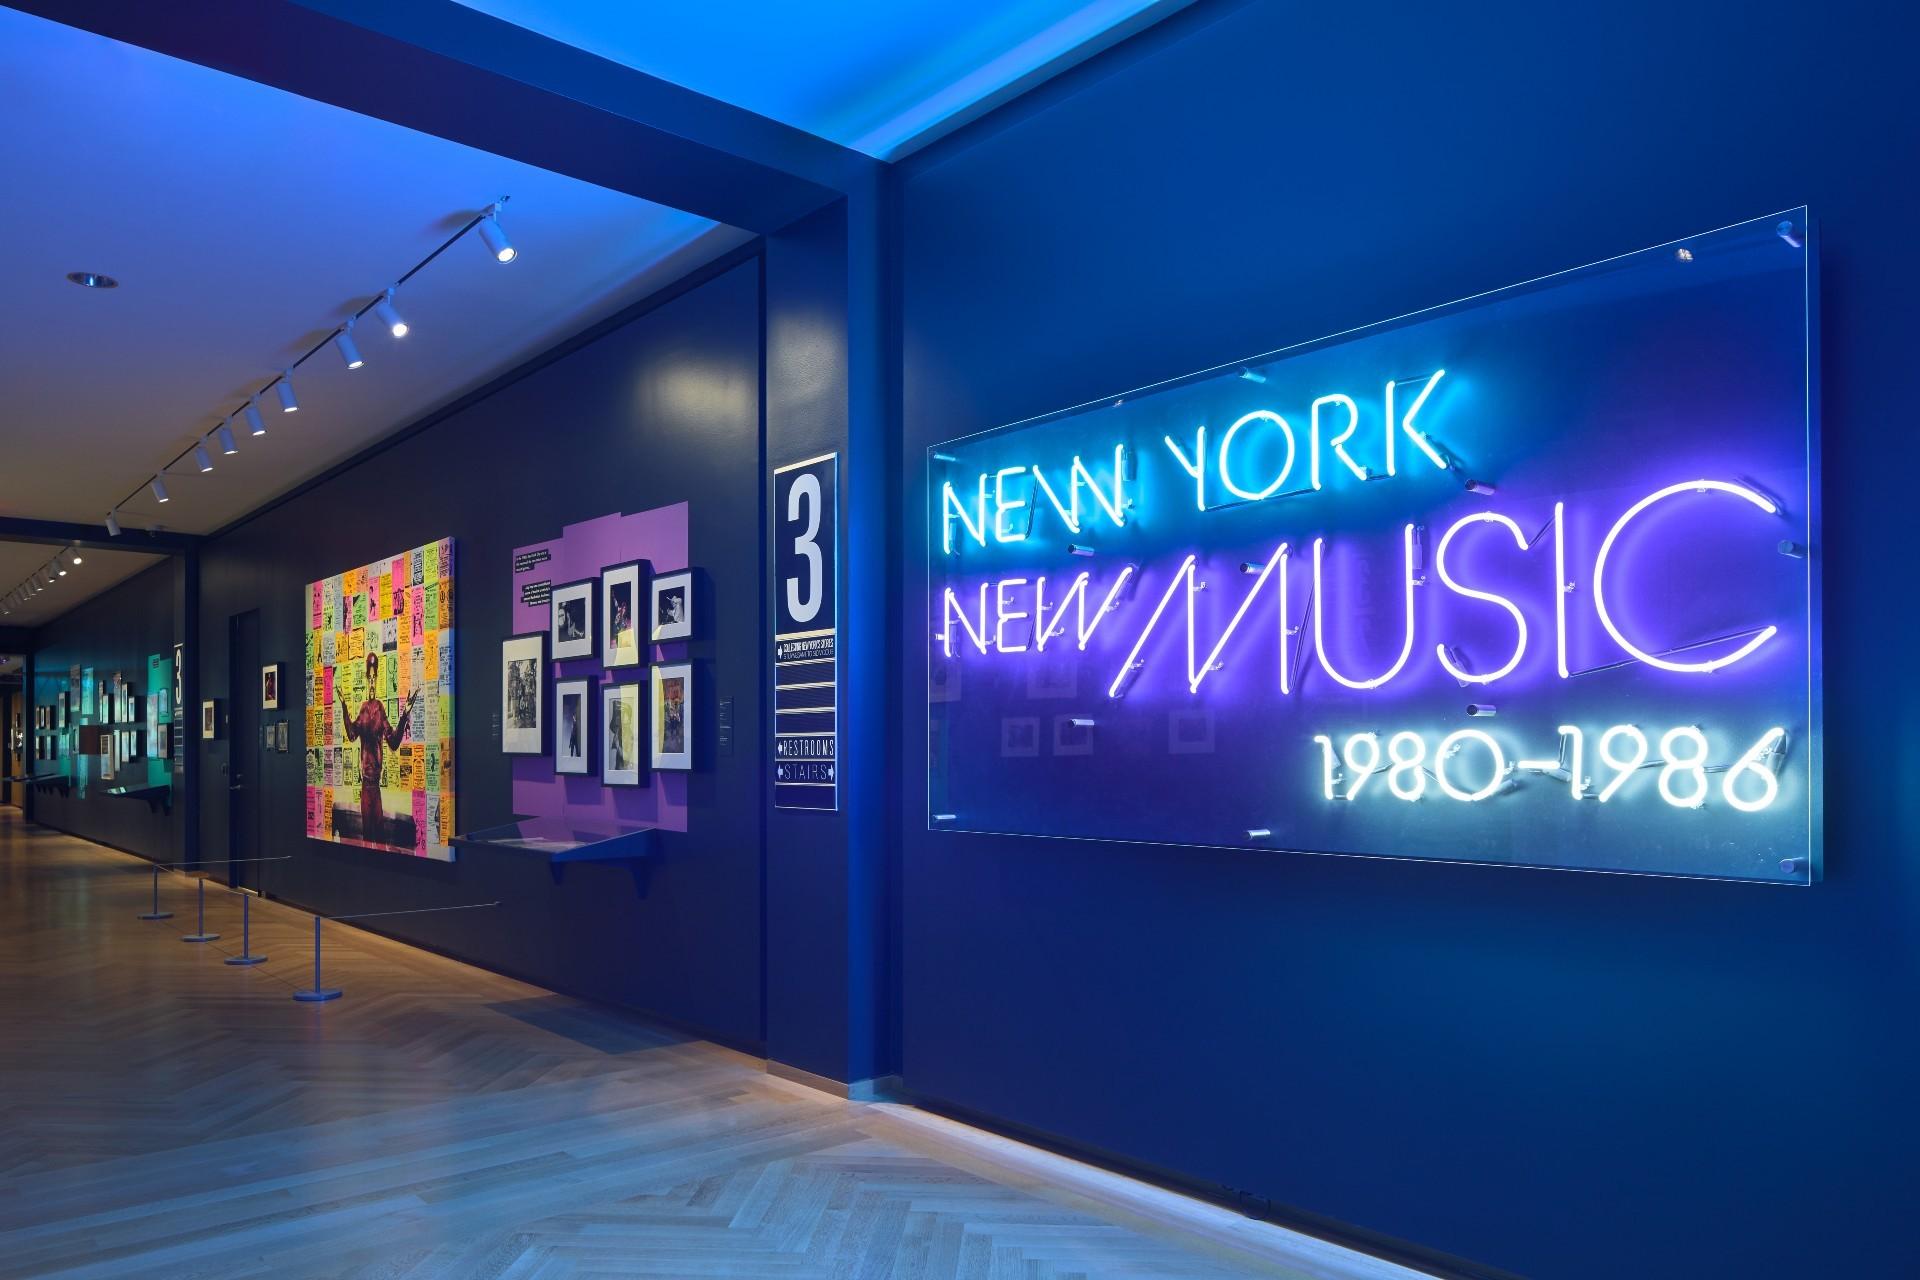 Museum of the city of new york new york new music